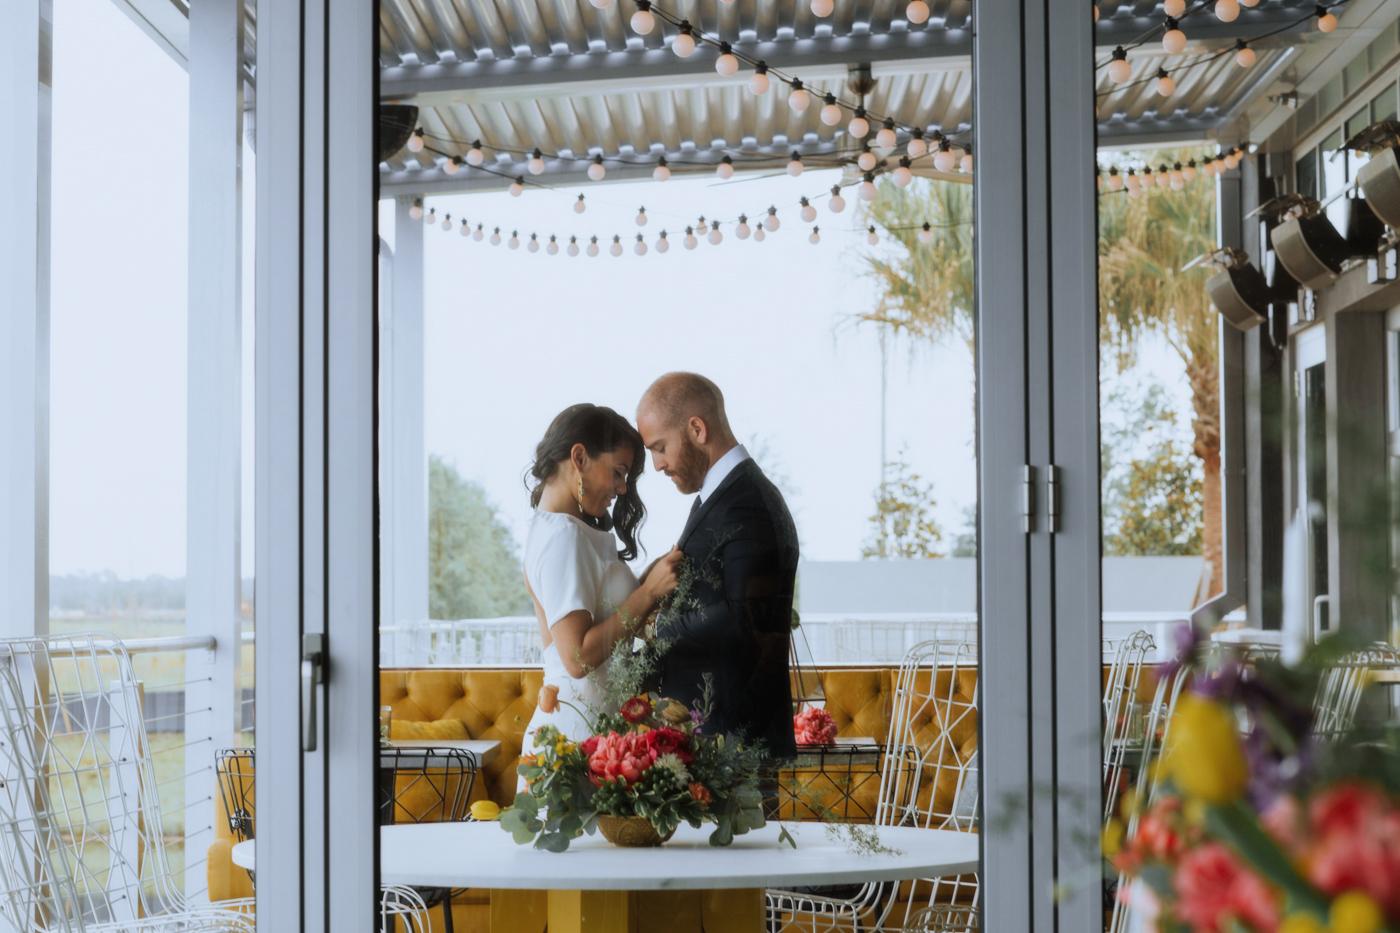 Wedding | Canvas Market | Lake Nona-Orlando, FL  | Vanessa Boy Photography | vanessaboy.com-218.com |Green Wedding Shoes.jpg